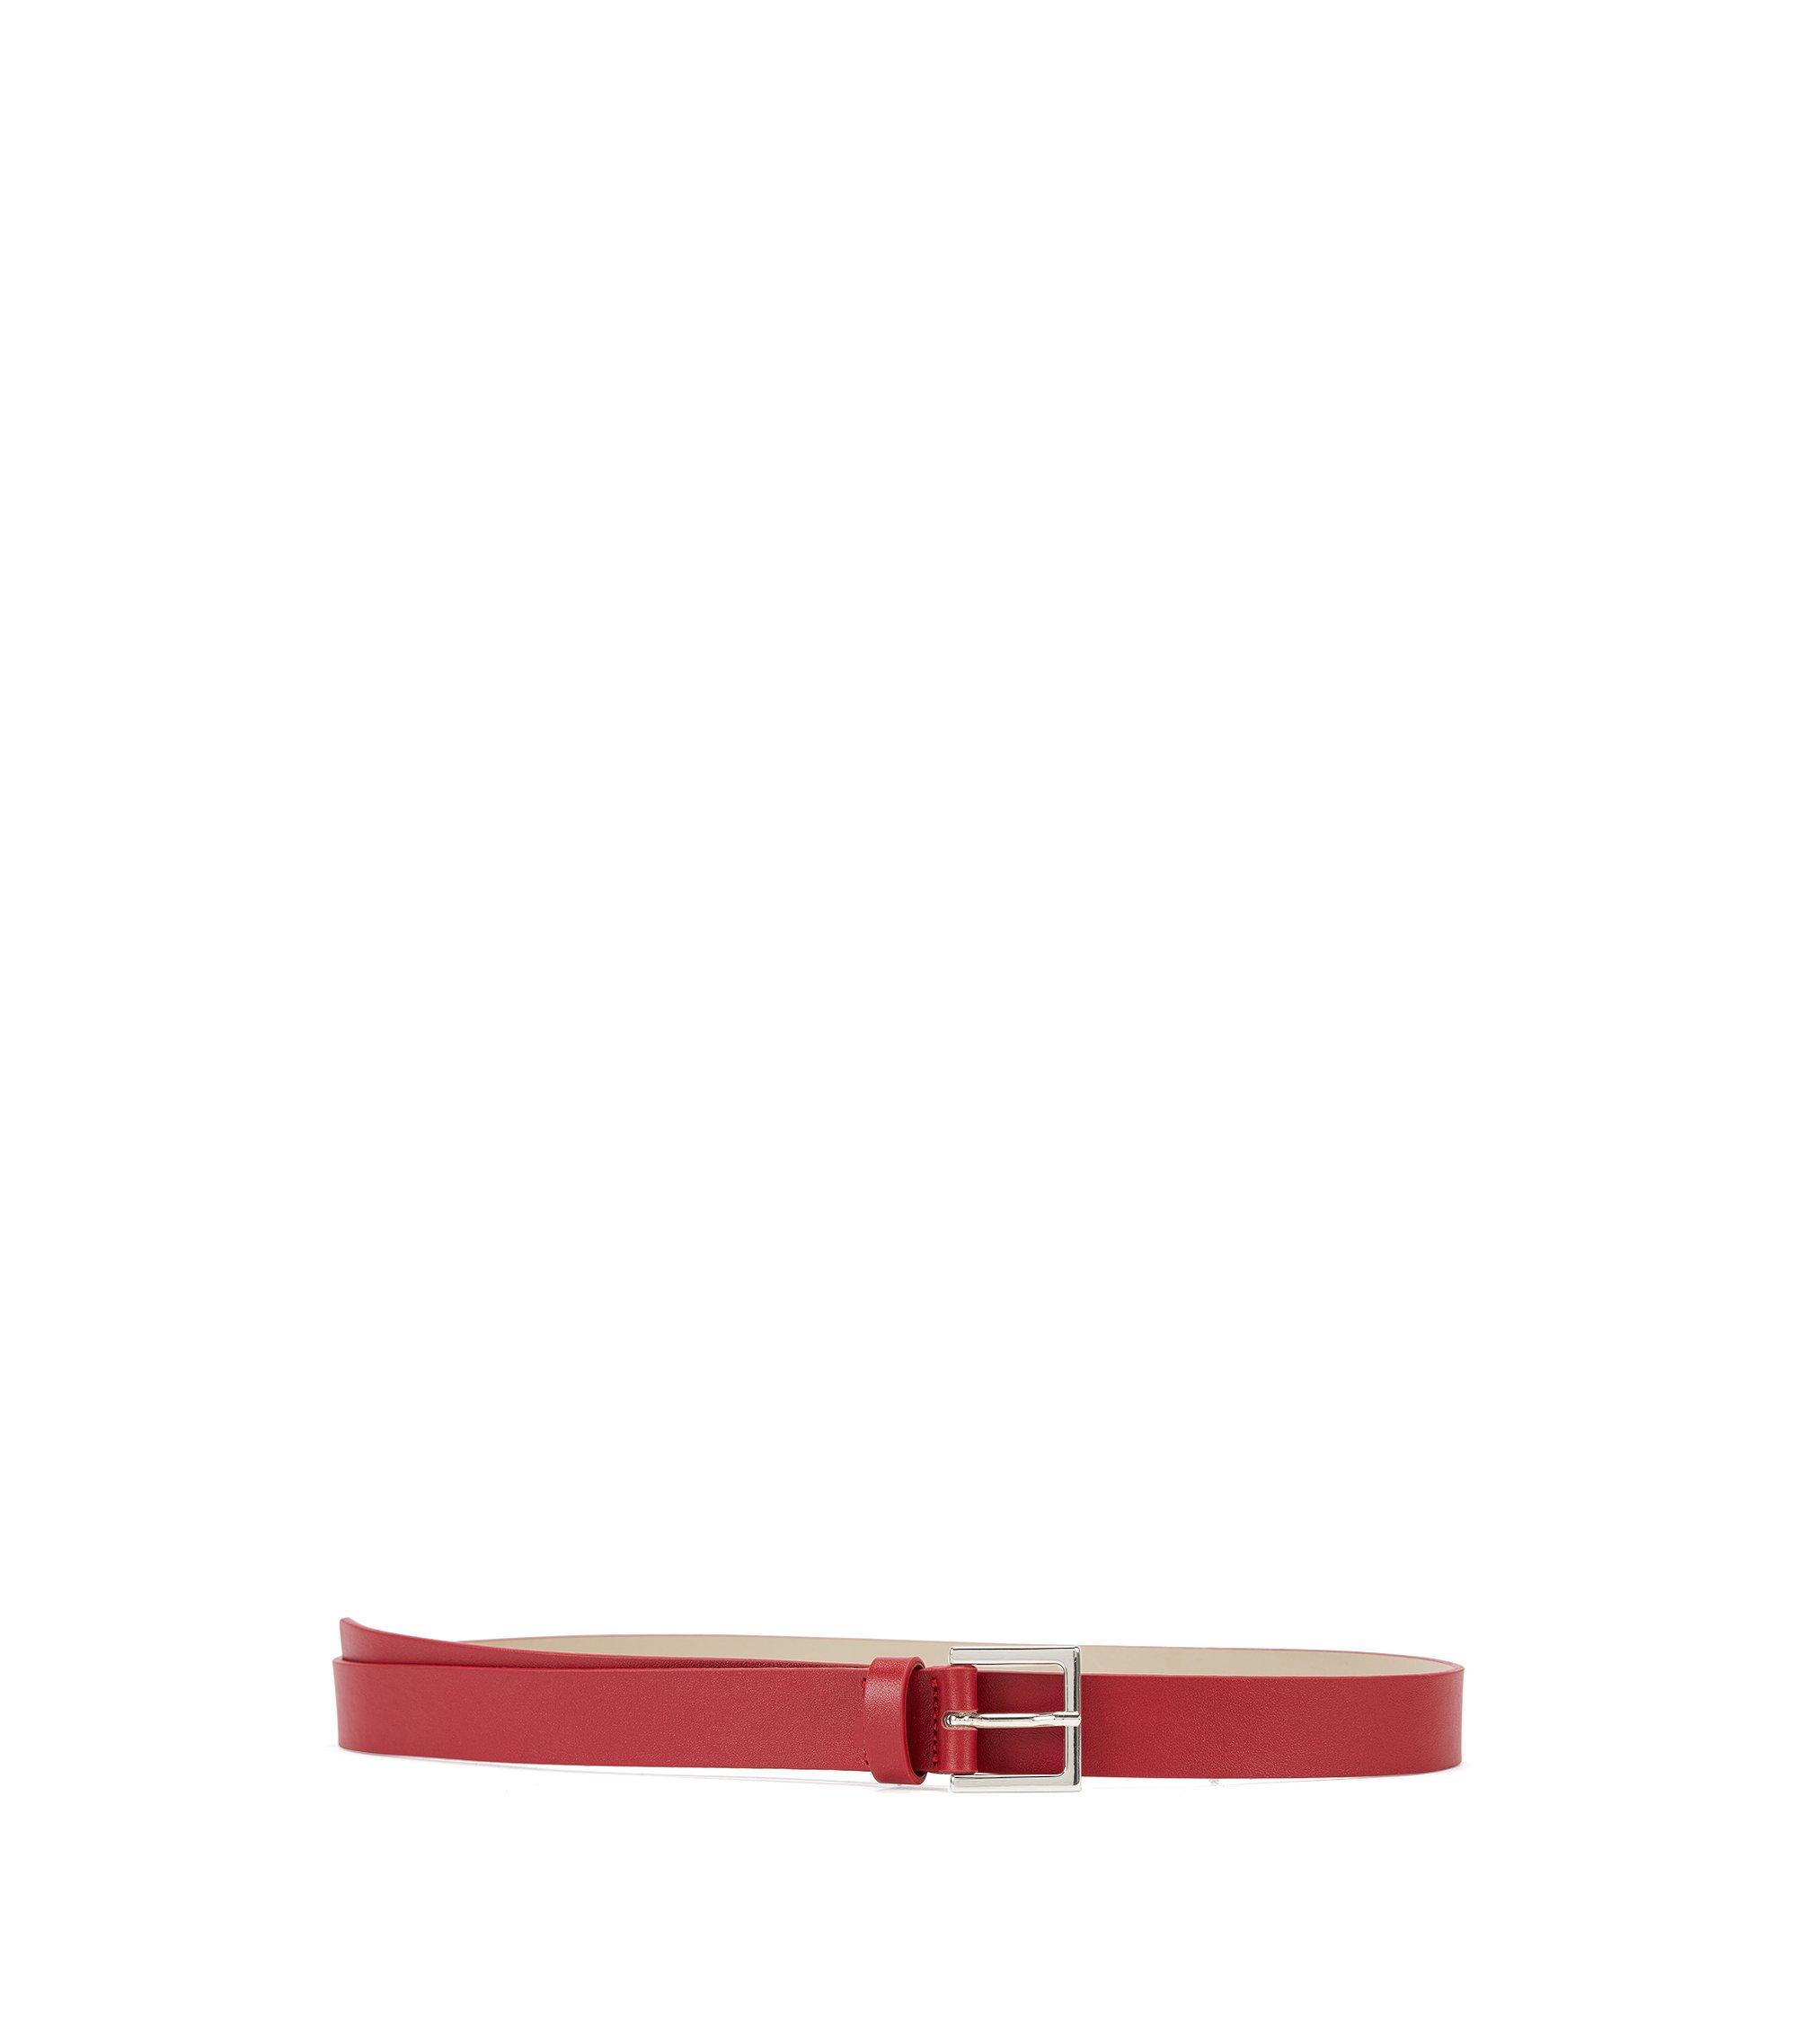 Schmaler Gürtel aus italienischem Leder, Rot